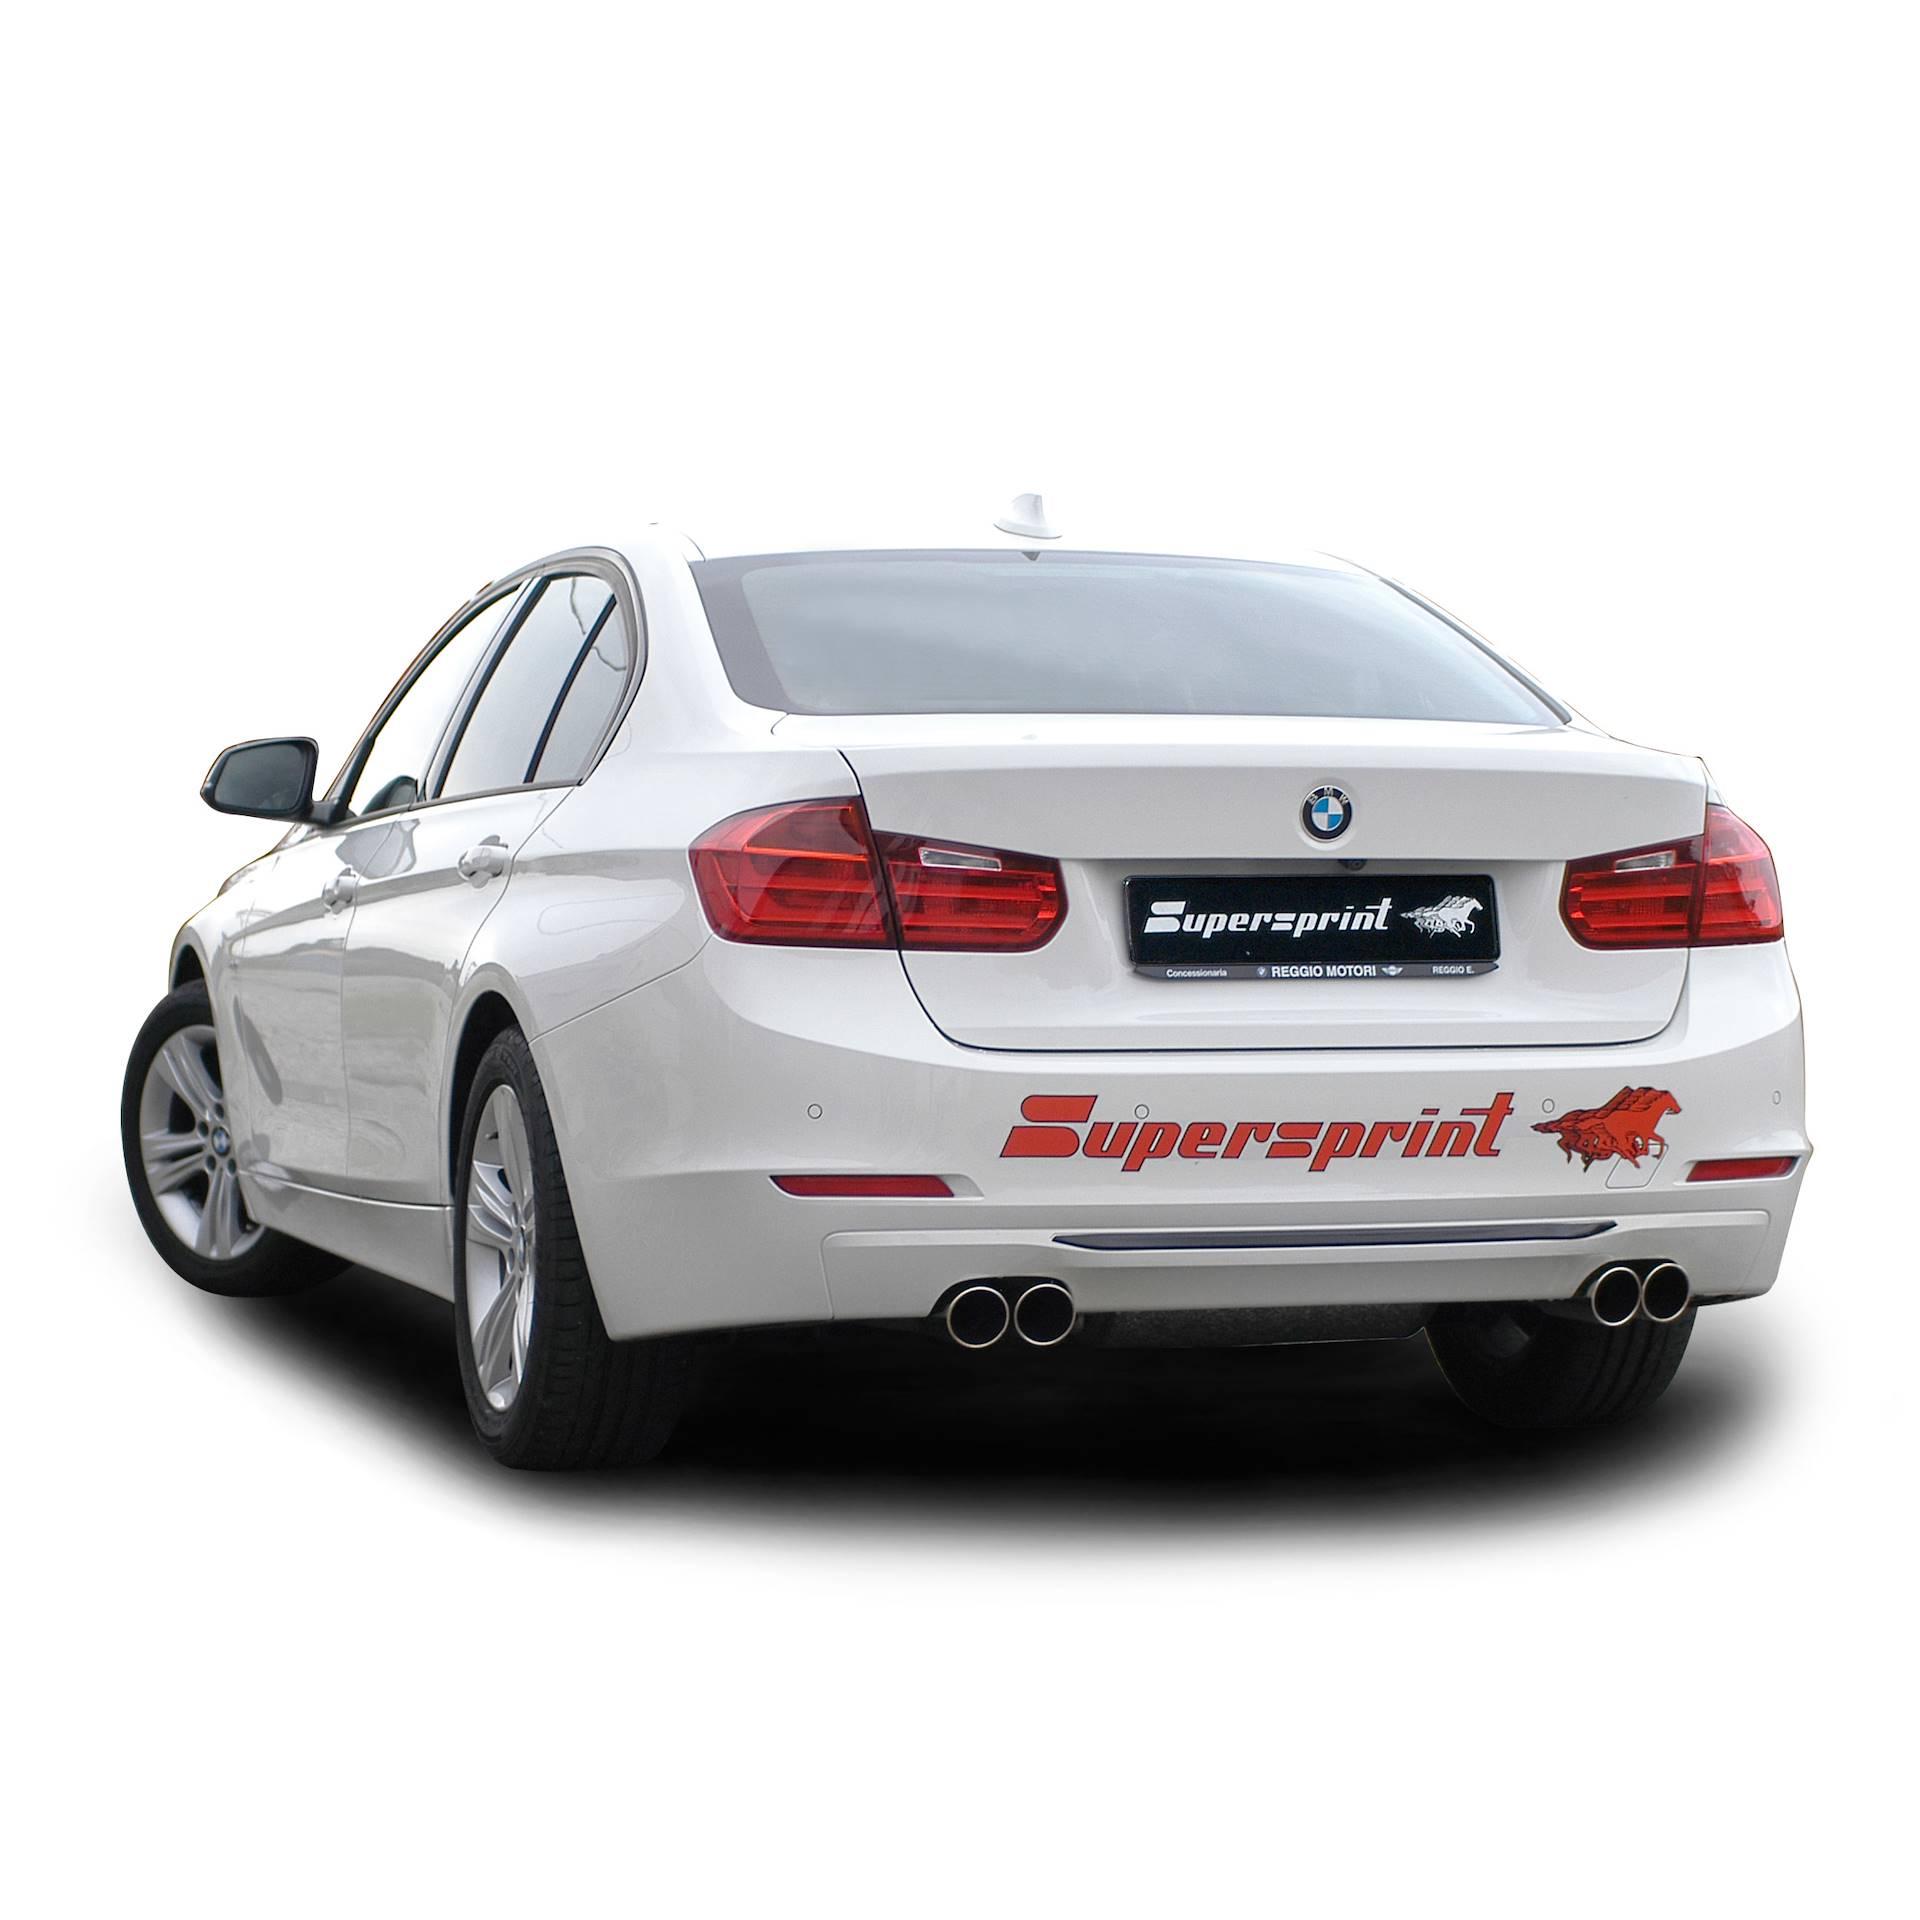 Performance sport exhaust for BMW F30 328i, BMW F30 (Sedan